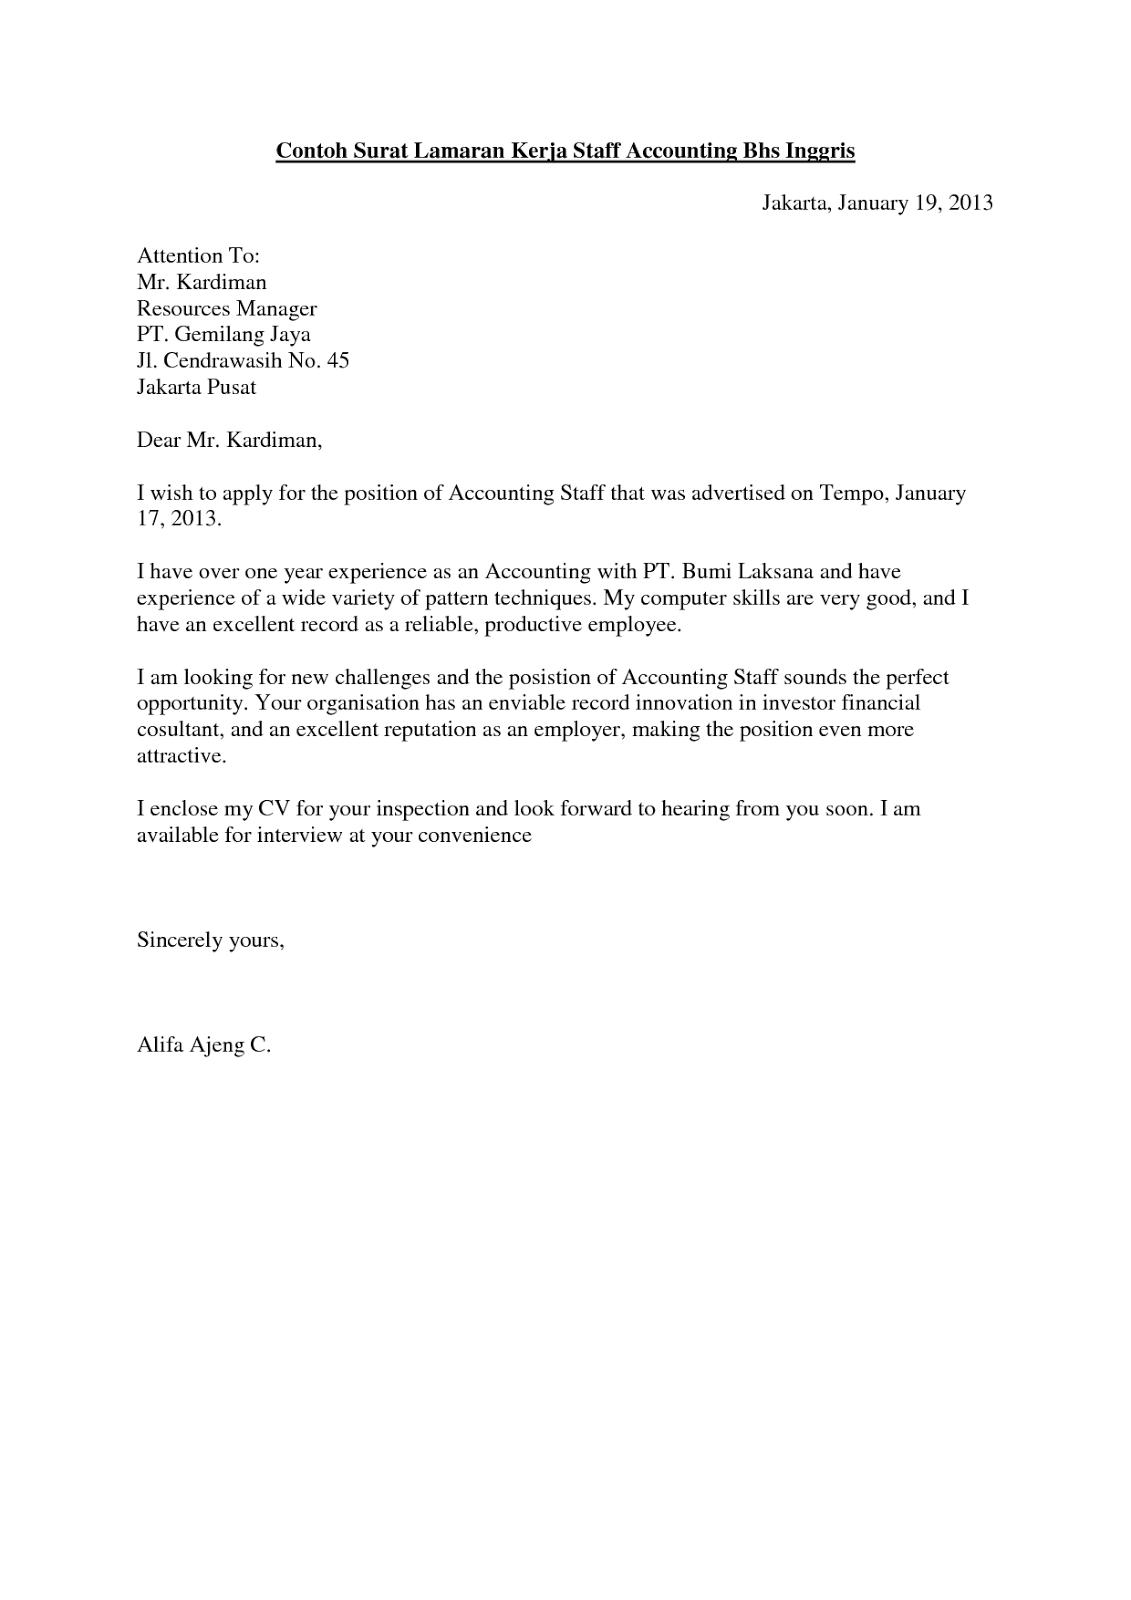 Letter Contoh Cover Letter Fresh Graduate